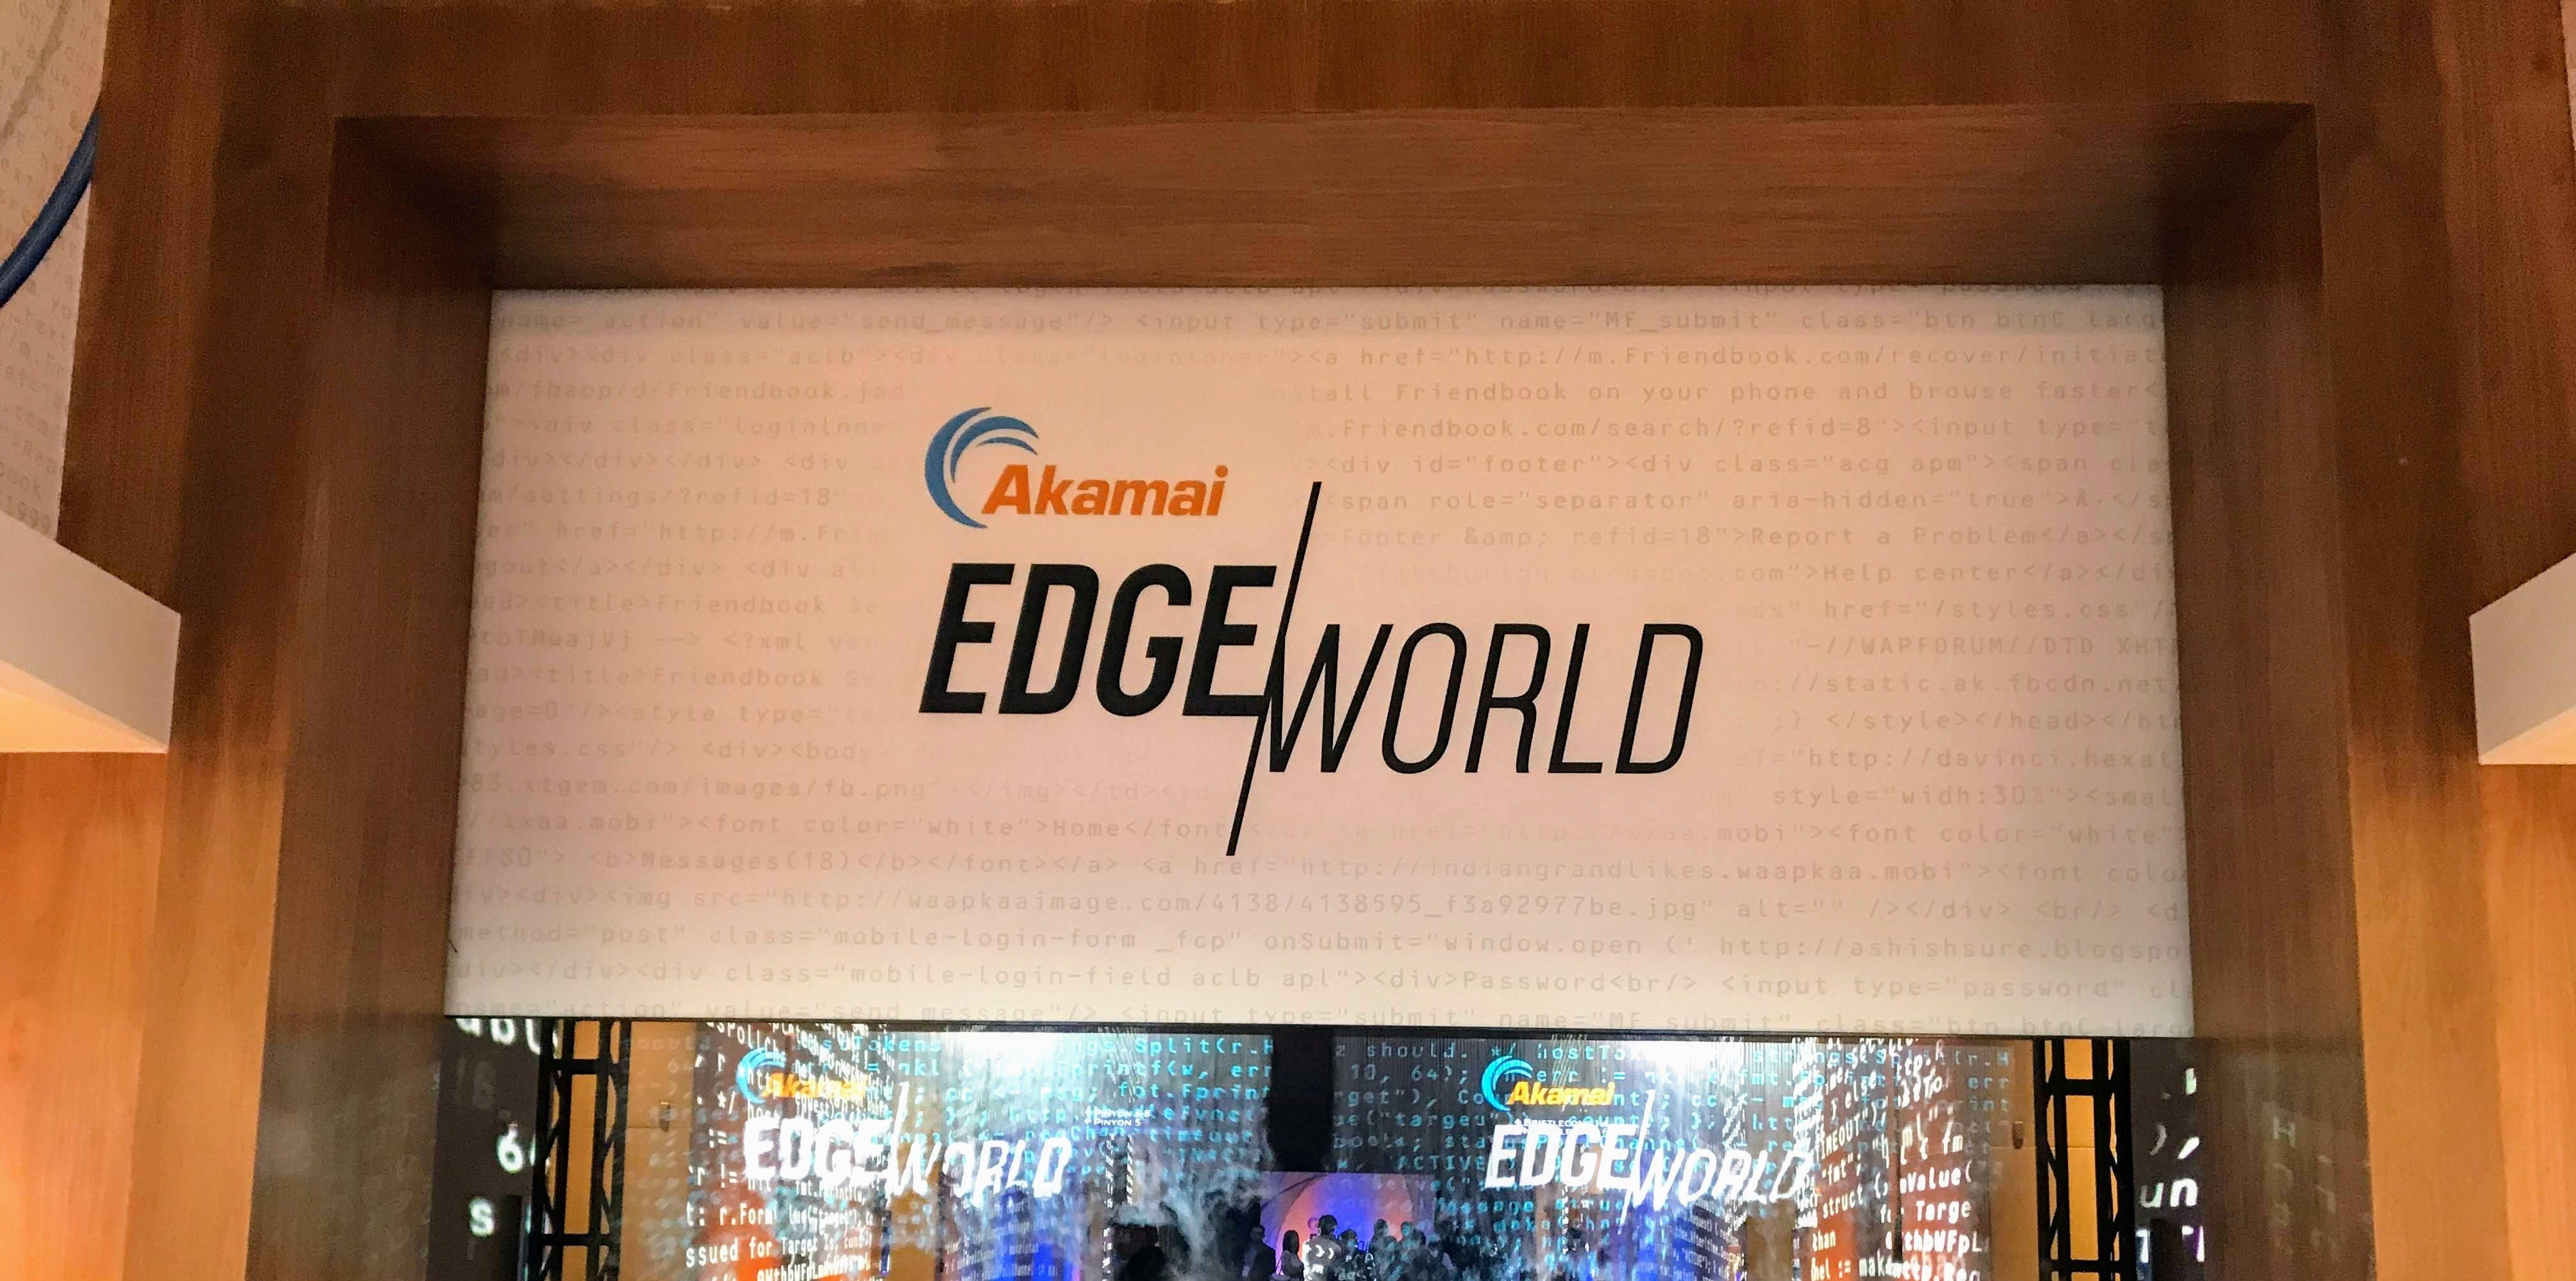 Akamai Edge World 2019 に参加してきました